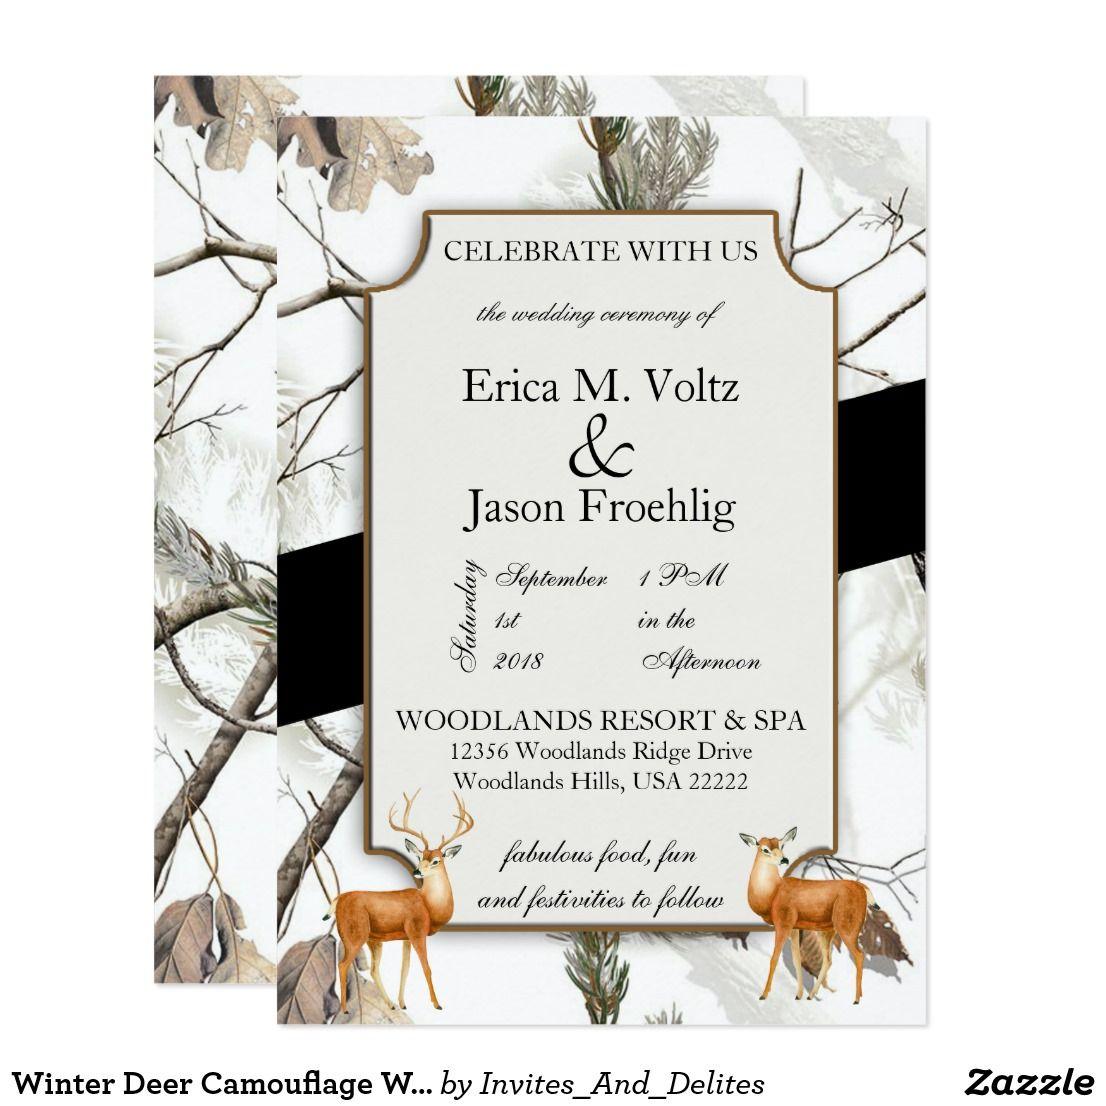 Winter Deer Camouflage Wedding Invitation  Weddings